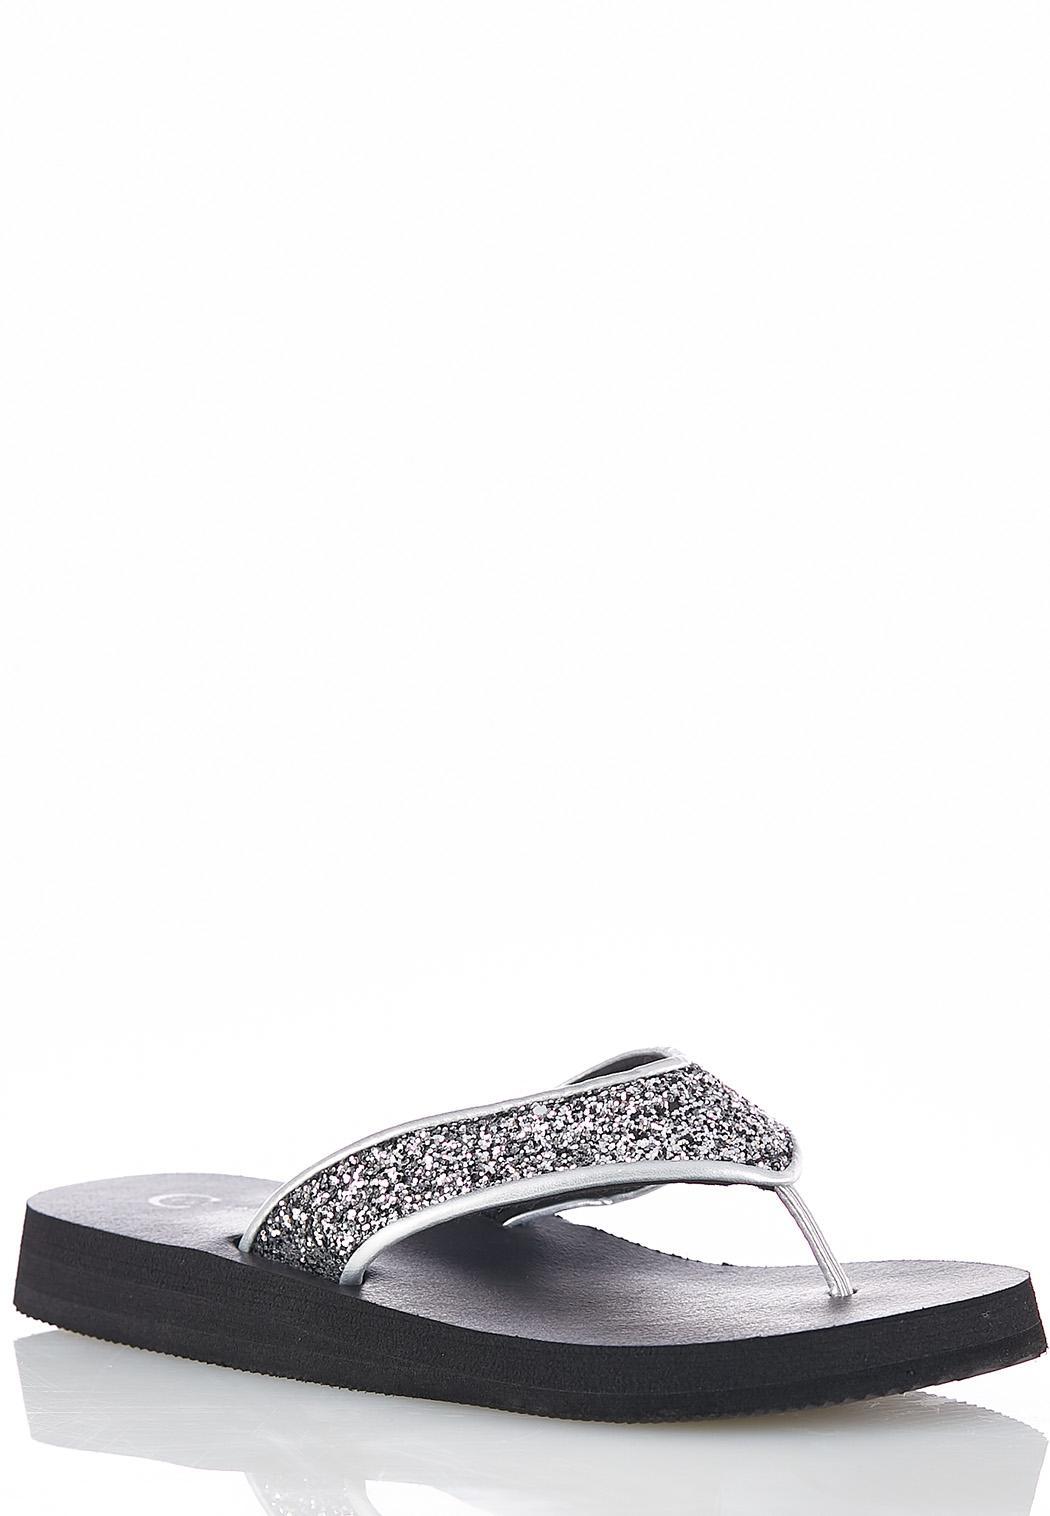 a39827cb9 Glitter Platform Flip Flops Flip Flops Cato Fashions